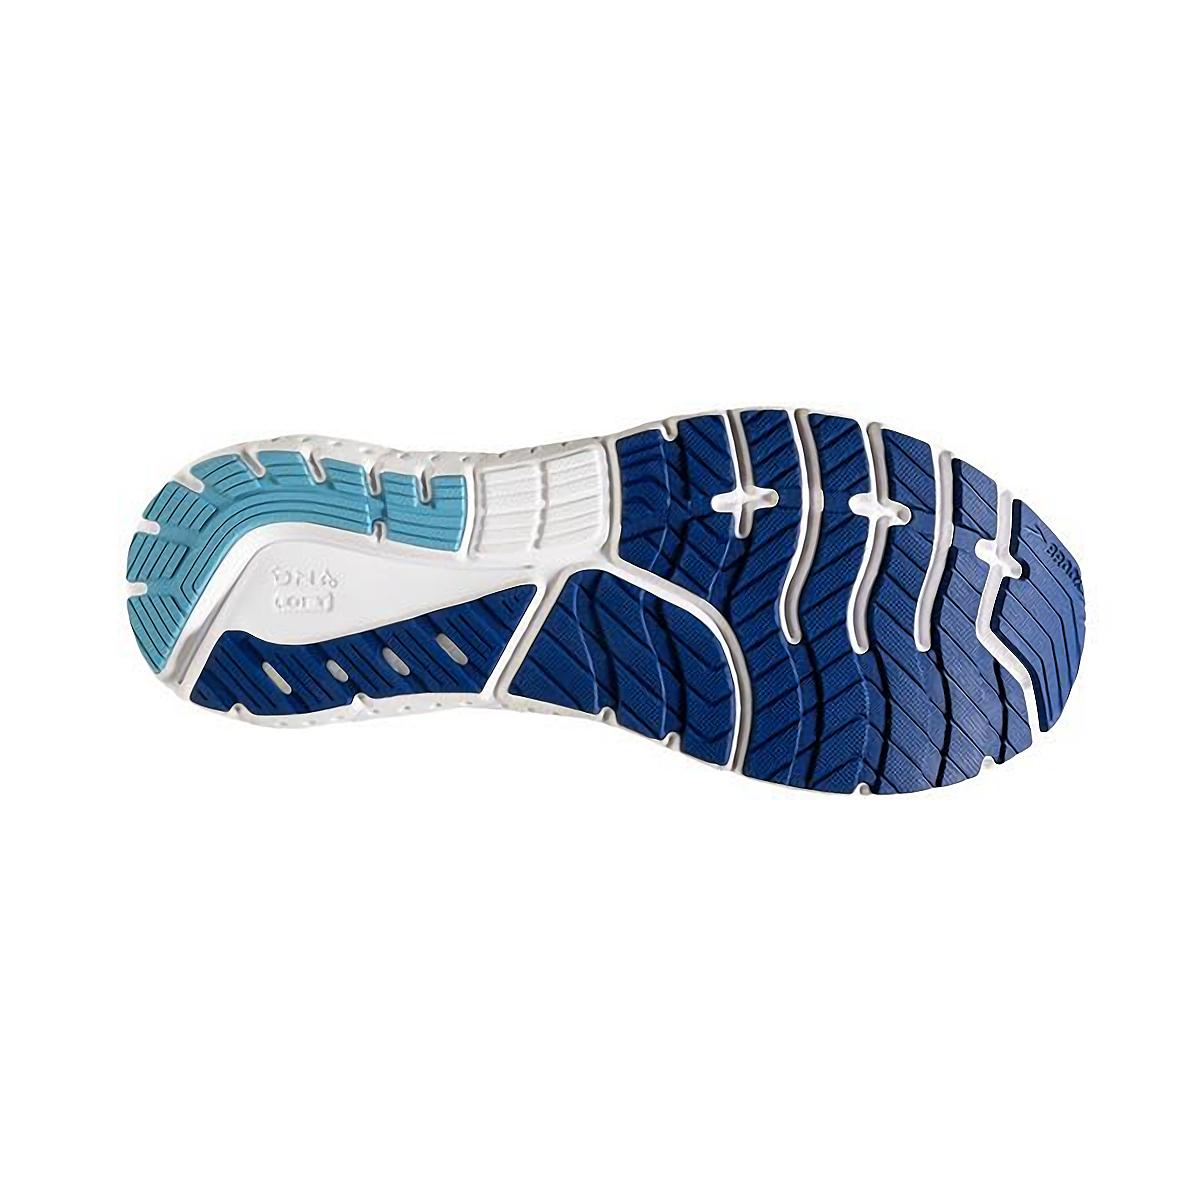 Men's Brooks Glycerin 18 Running Shoe - Color: Blue/Marazine/Gold - Size: 7 - Width: Regular, Blue/Marazine/Gold, large, image 3